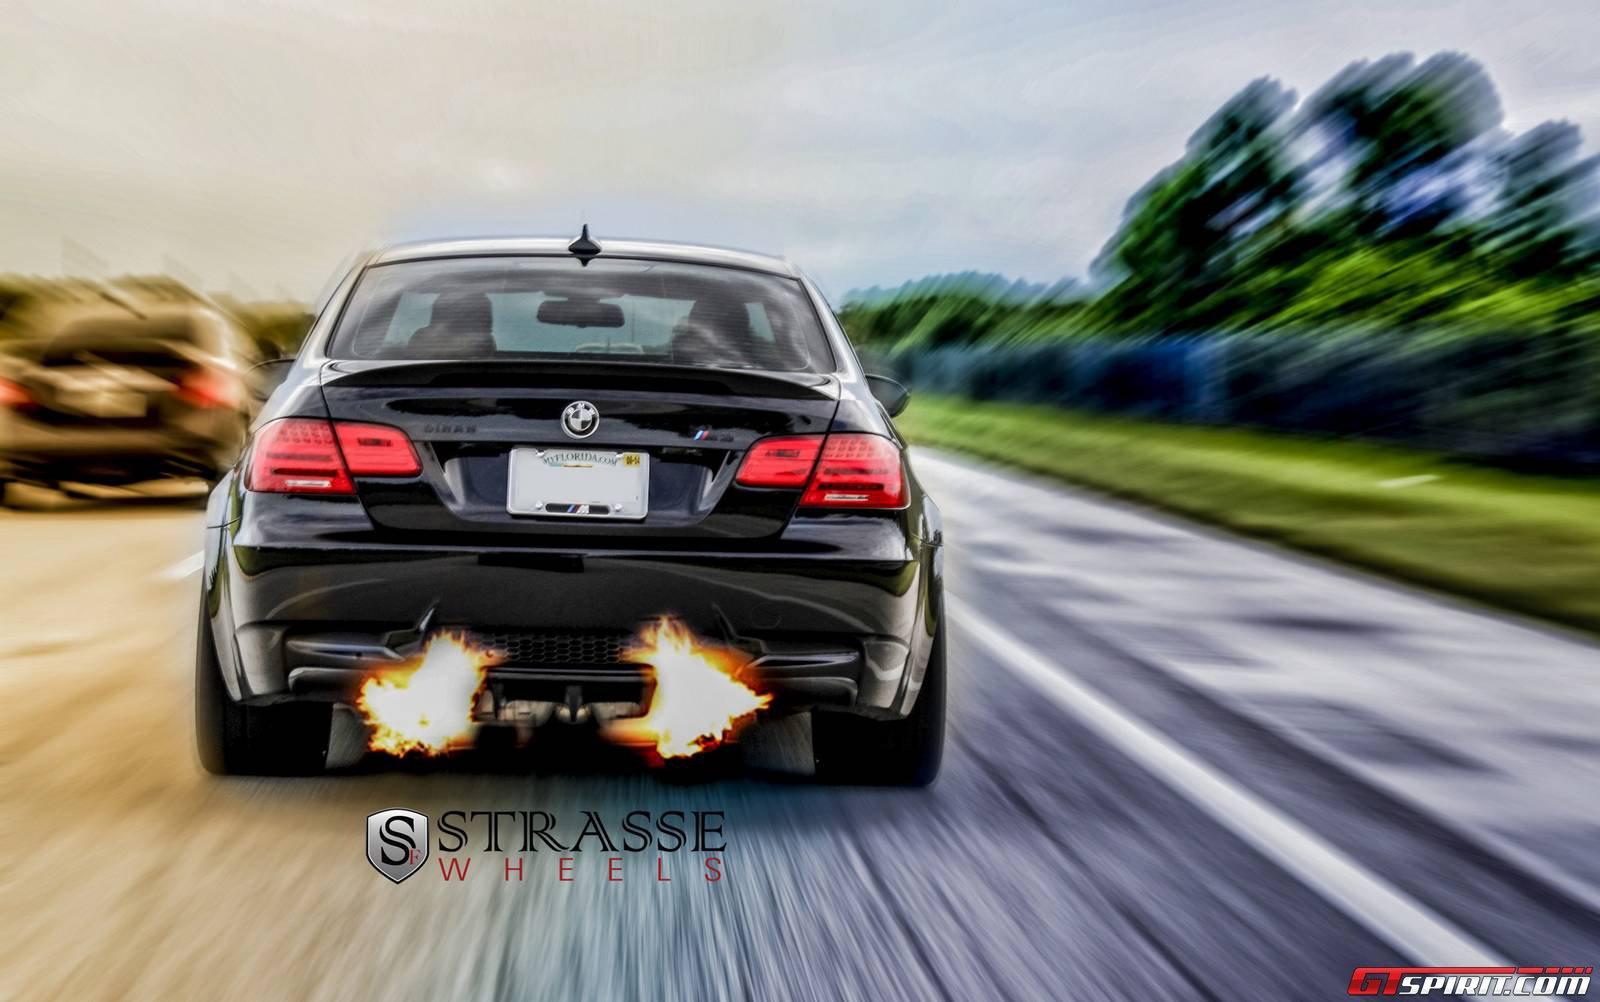 Jerez Black Bmw M3 Lowered On Sm7 Strasse Wheels Gtspirit